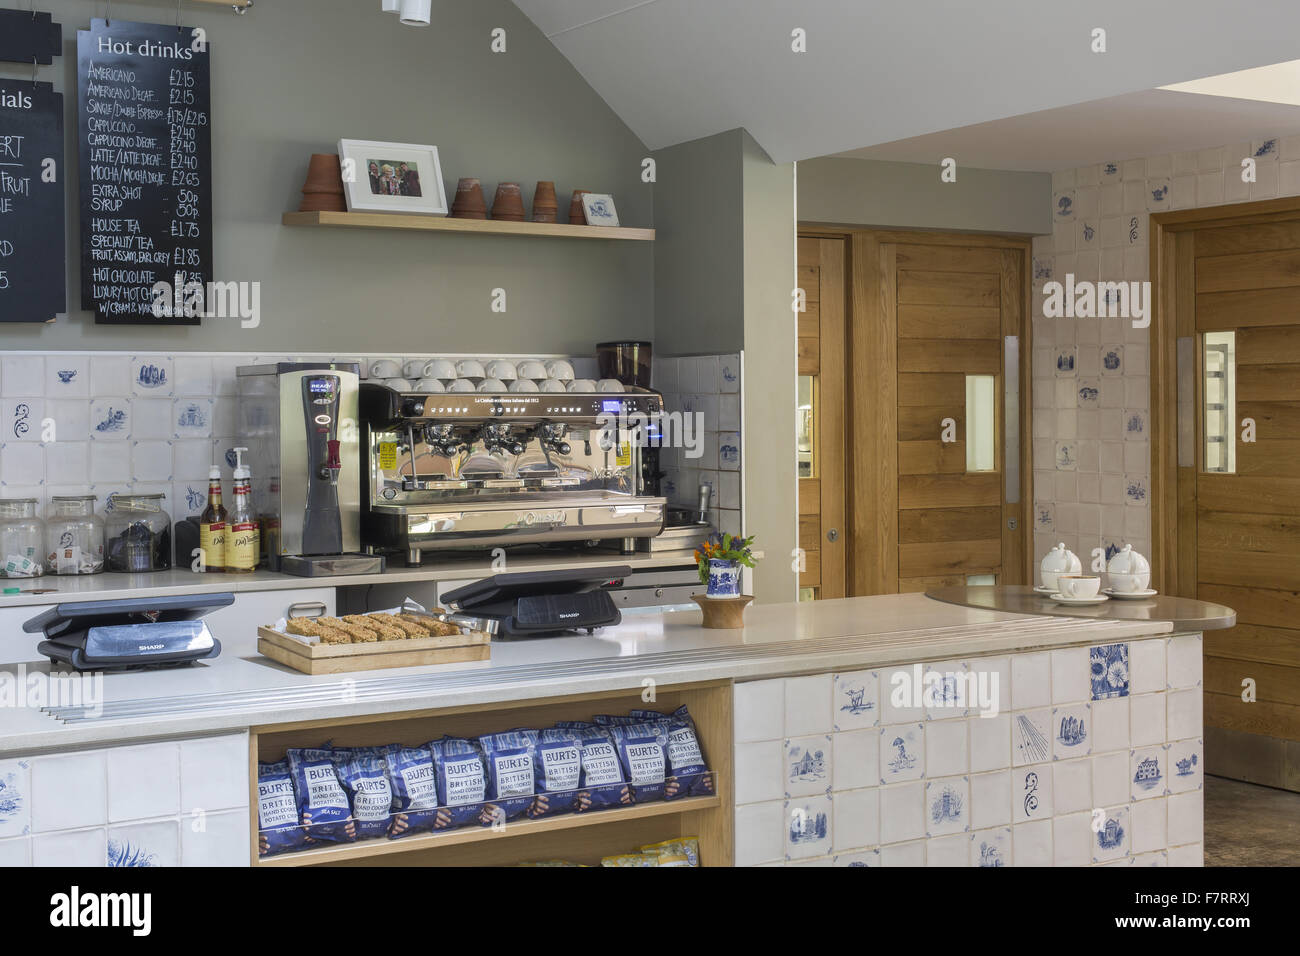 The Garden Kitchen The Garden Kitchen Cafe At Packwood House Warwickshire Stock